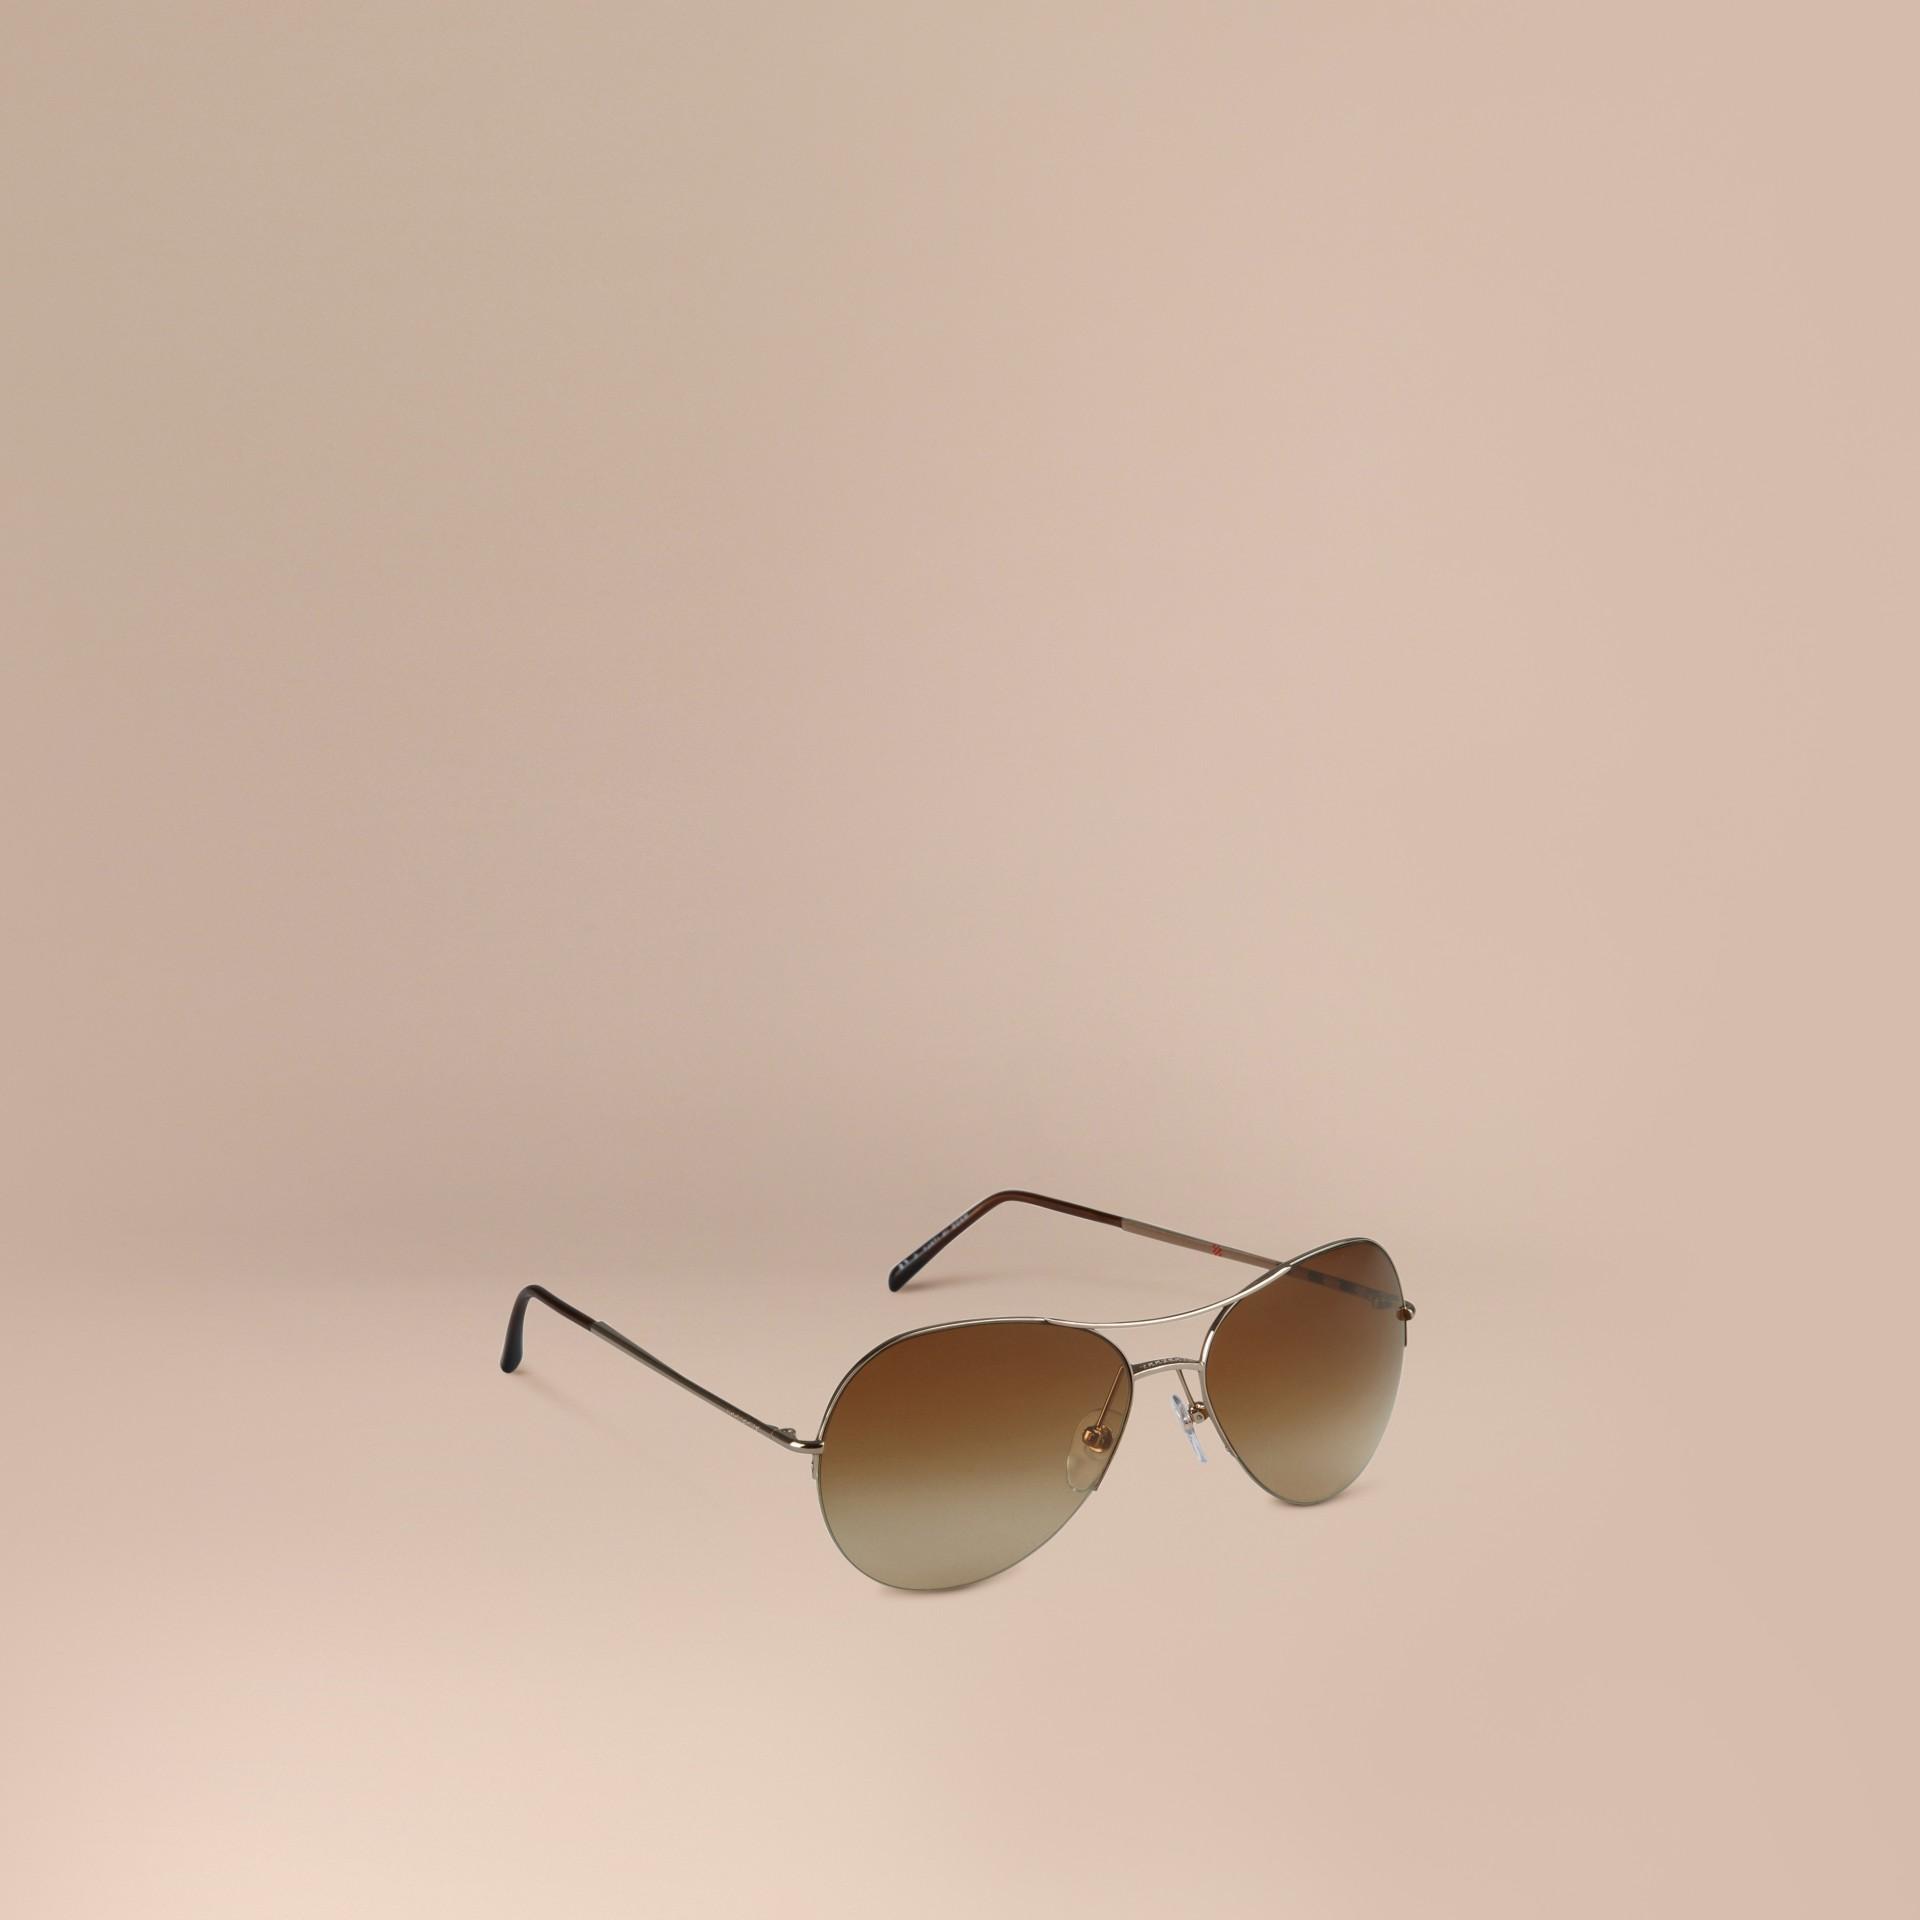 Burberry Glasses Half Frame : Half-Frame Pilot Sunglasses in Pale Gold - Women Burberry